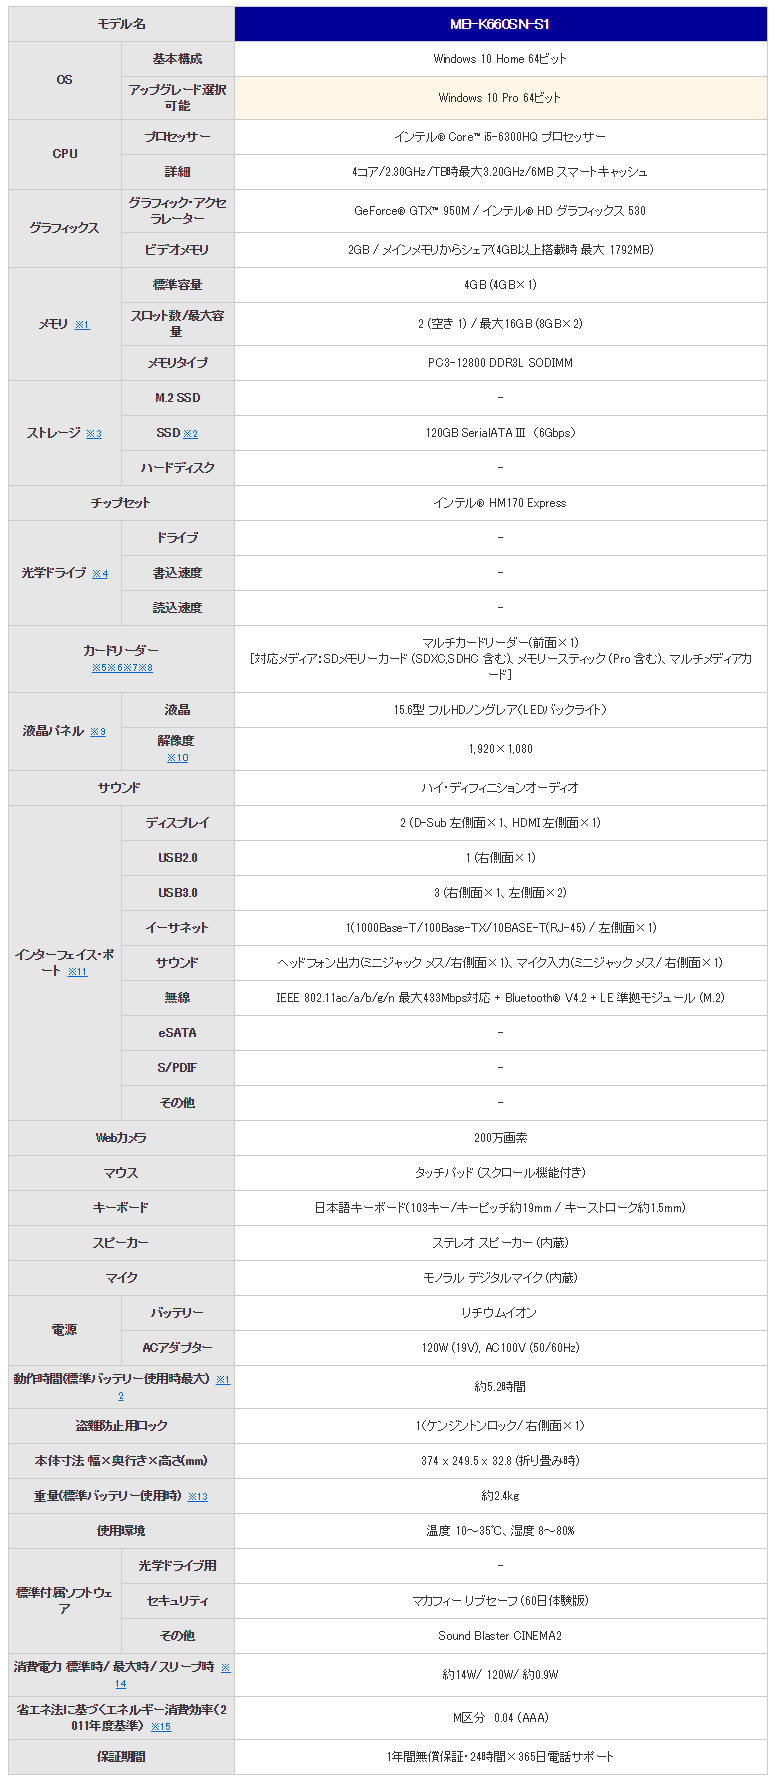 m-Book K シリーズ スペック表